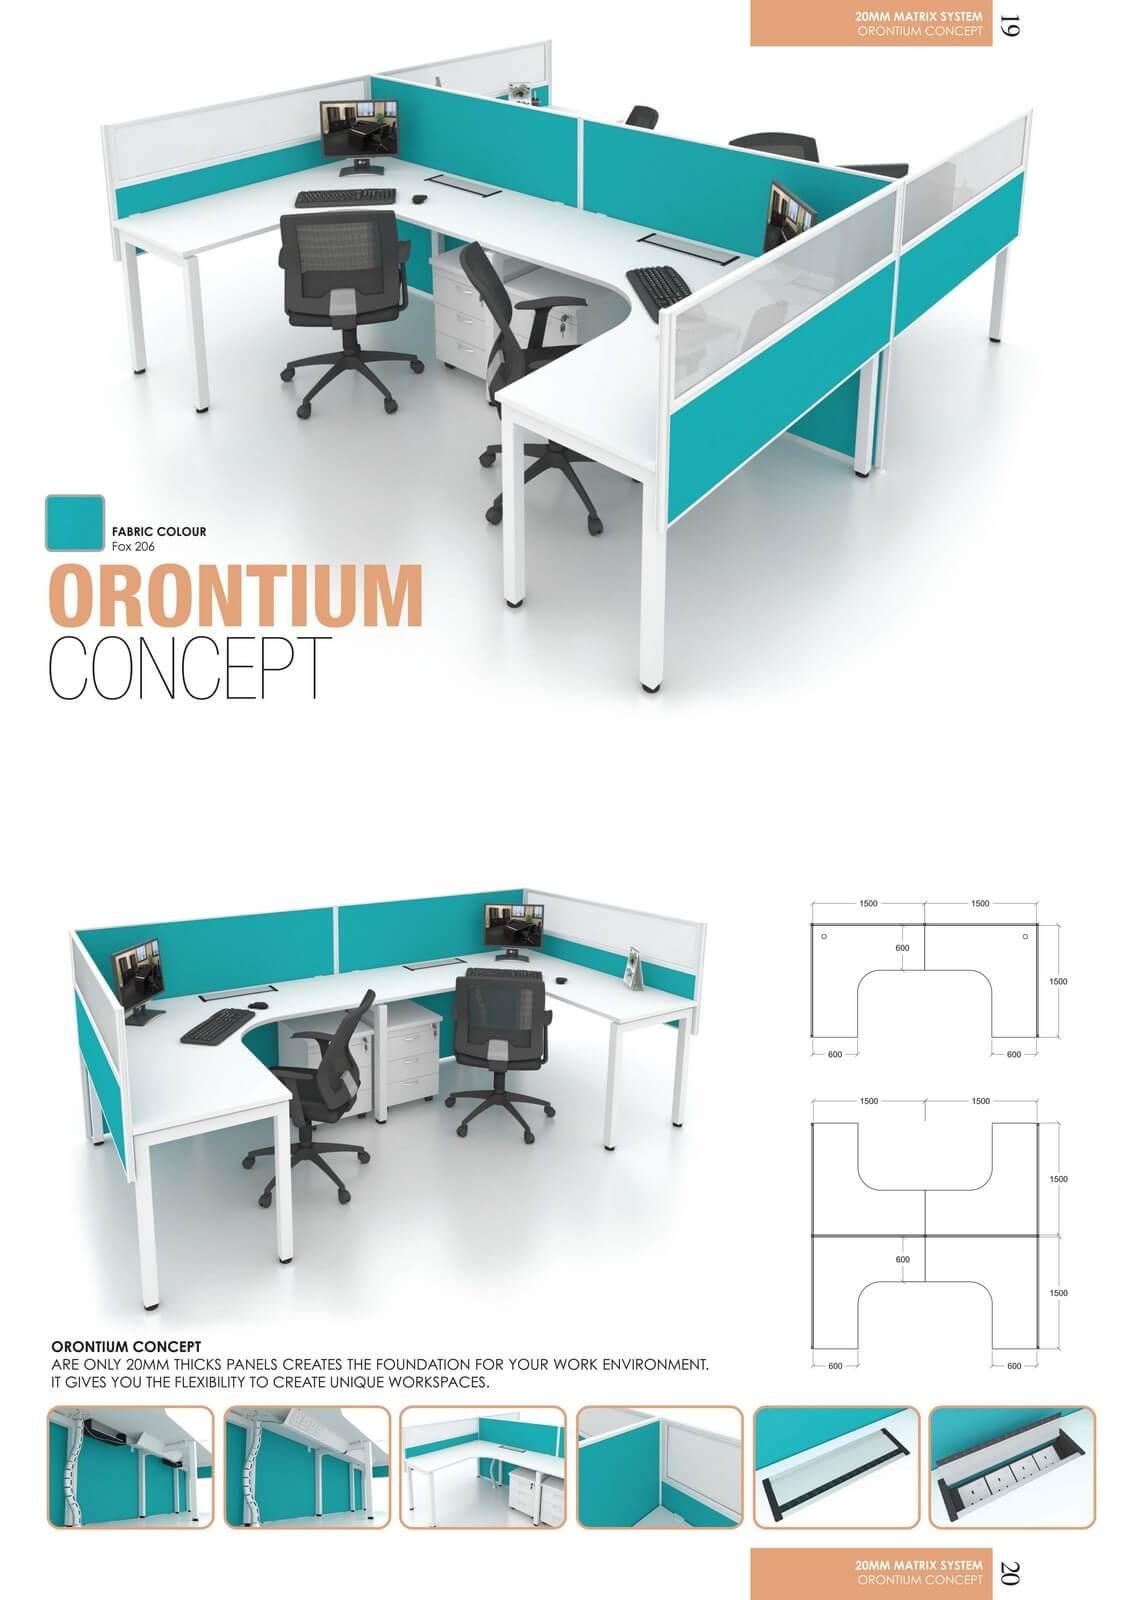 Office Workstation Orontium Concept